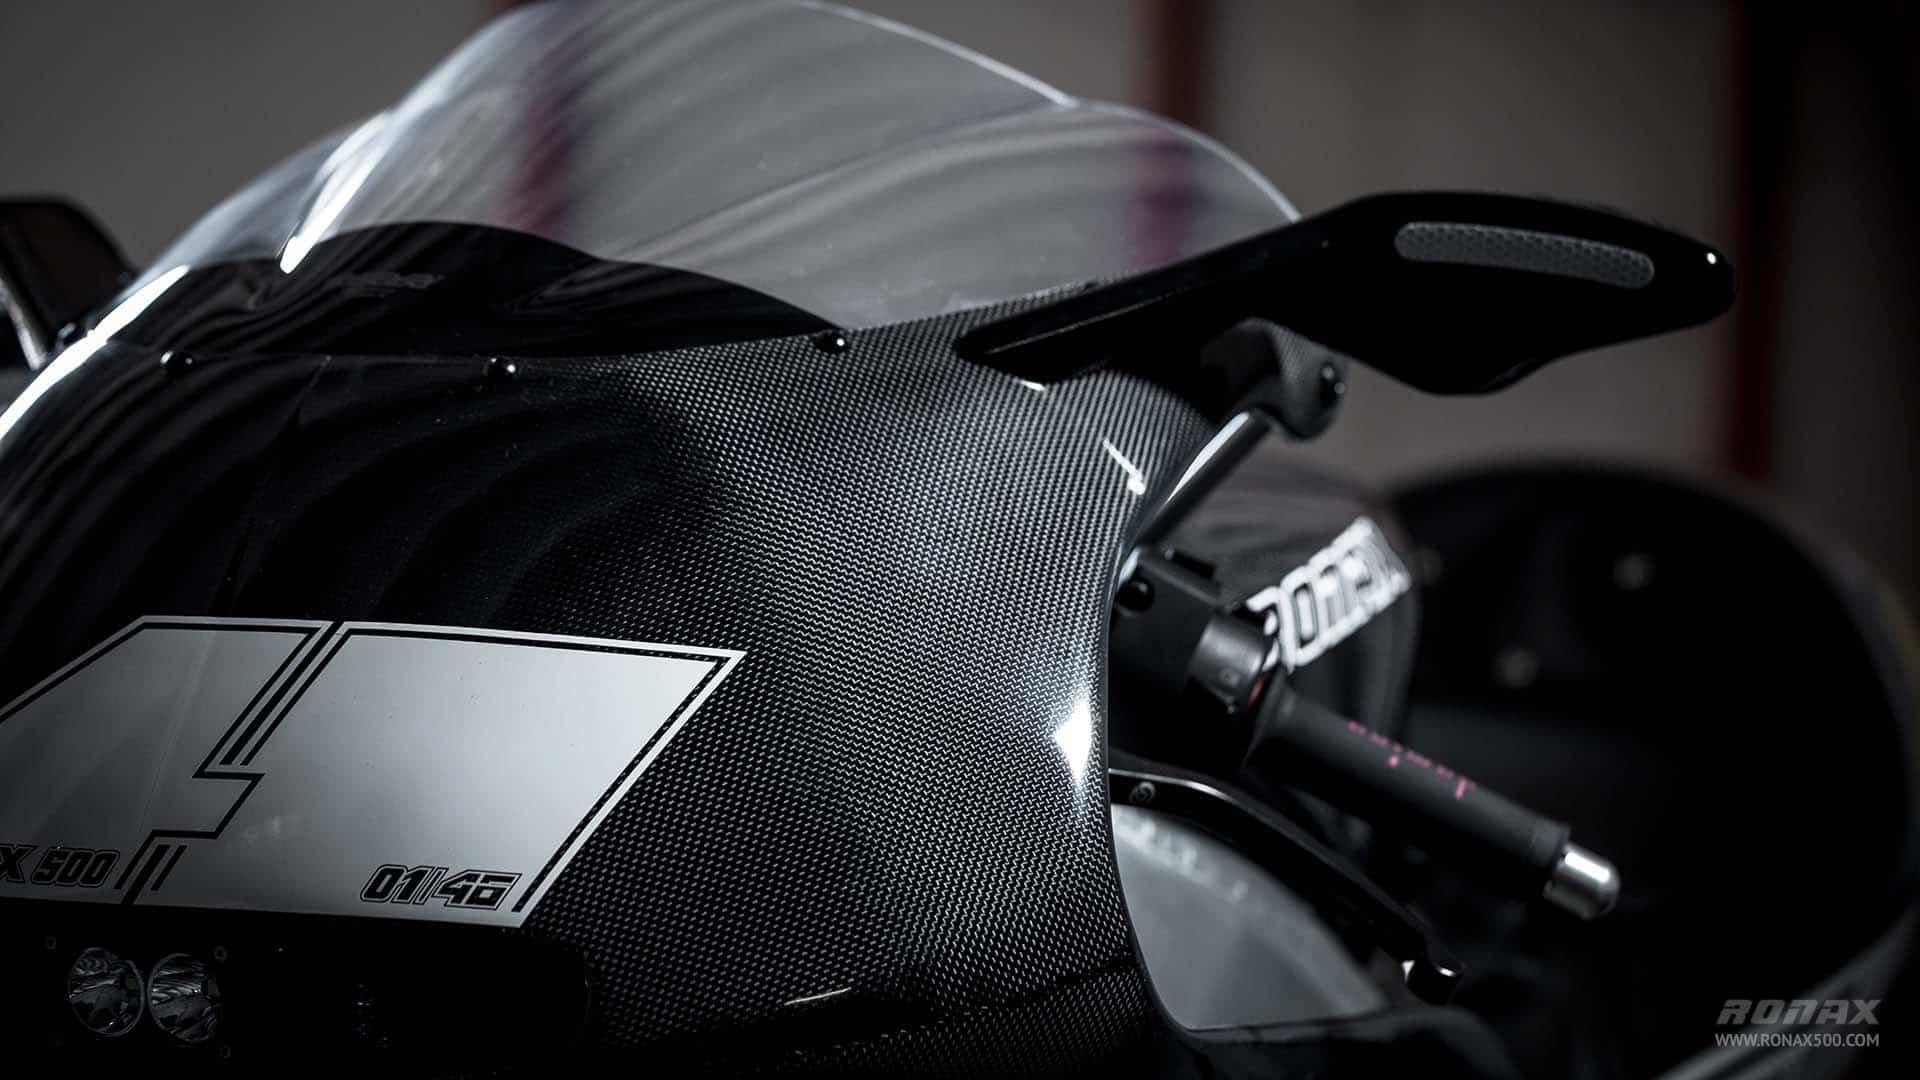 Ronax-500-Motorbike 10